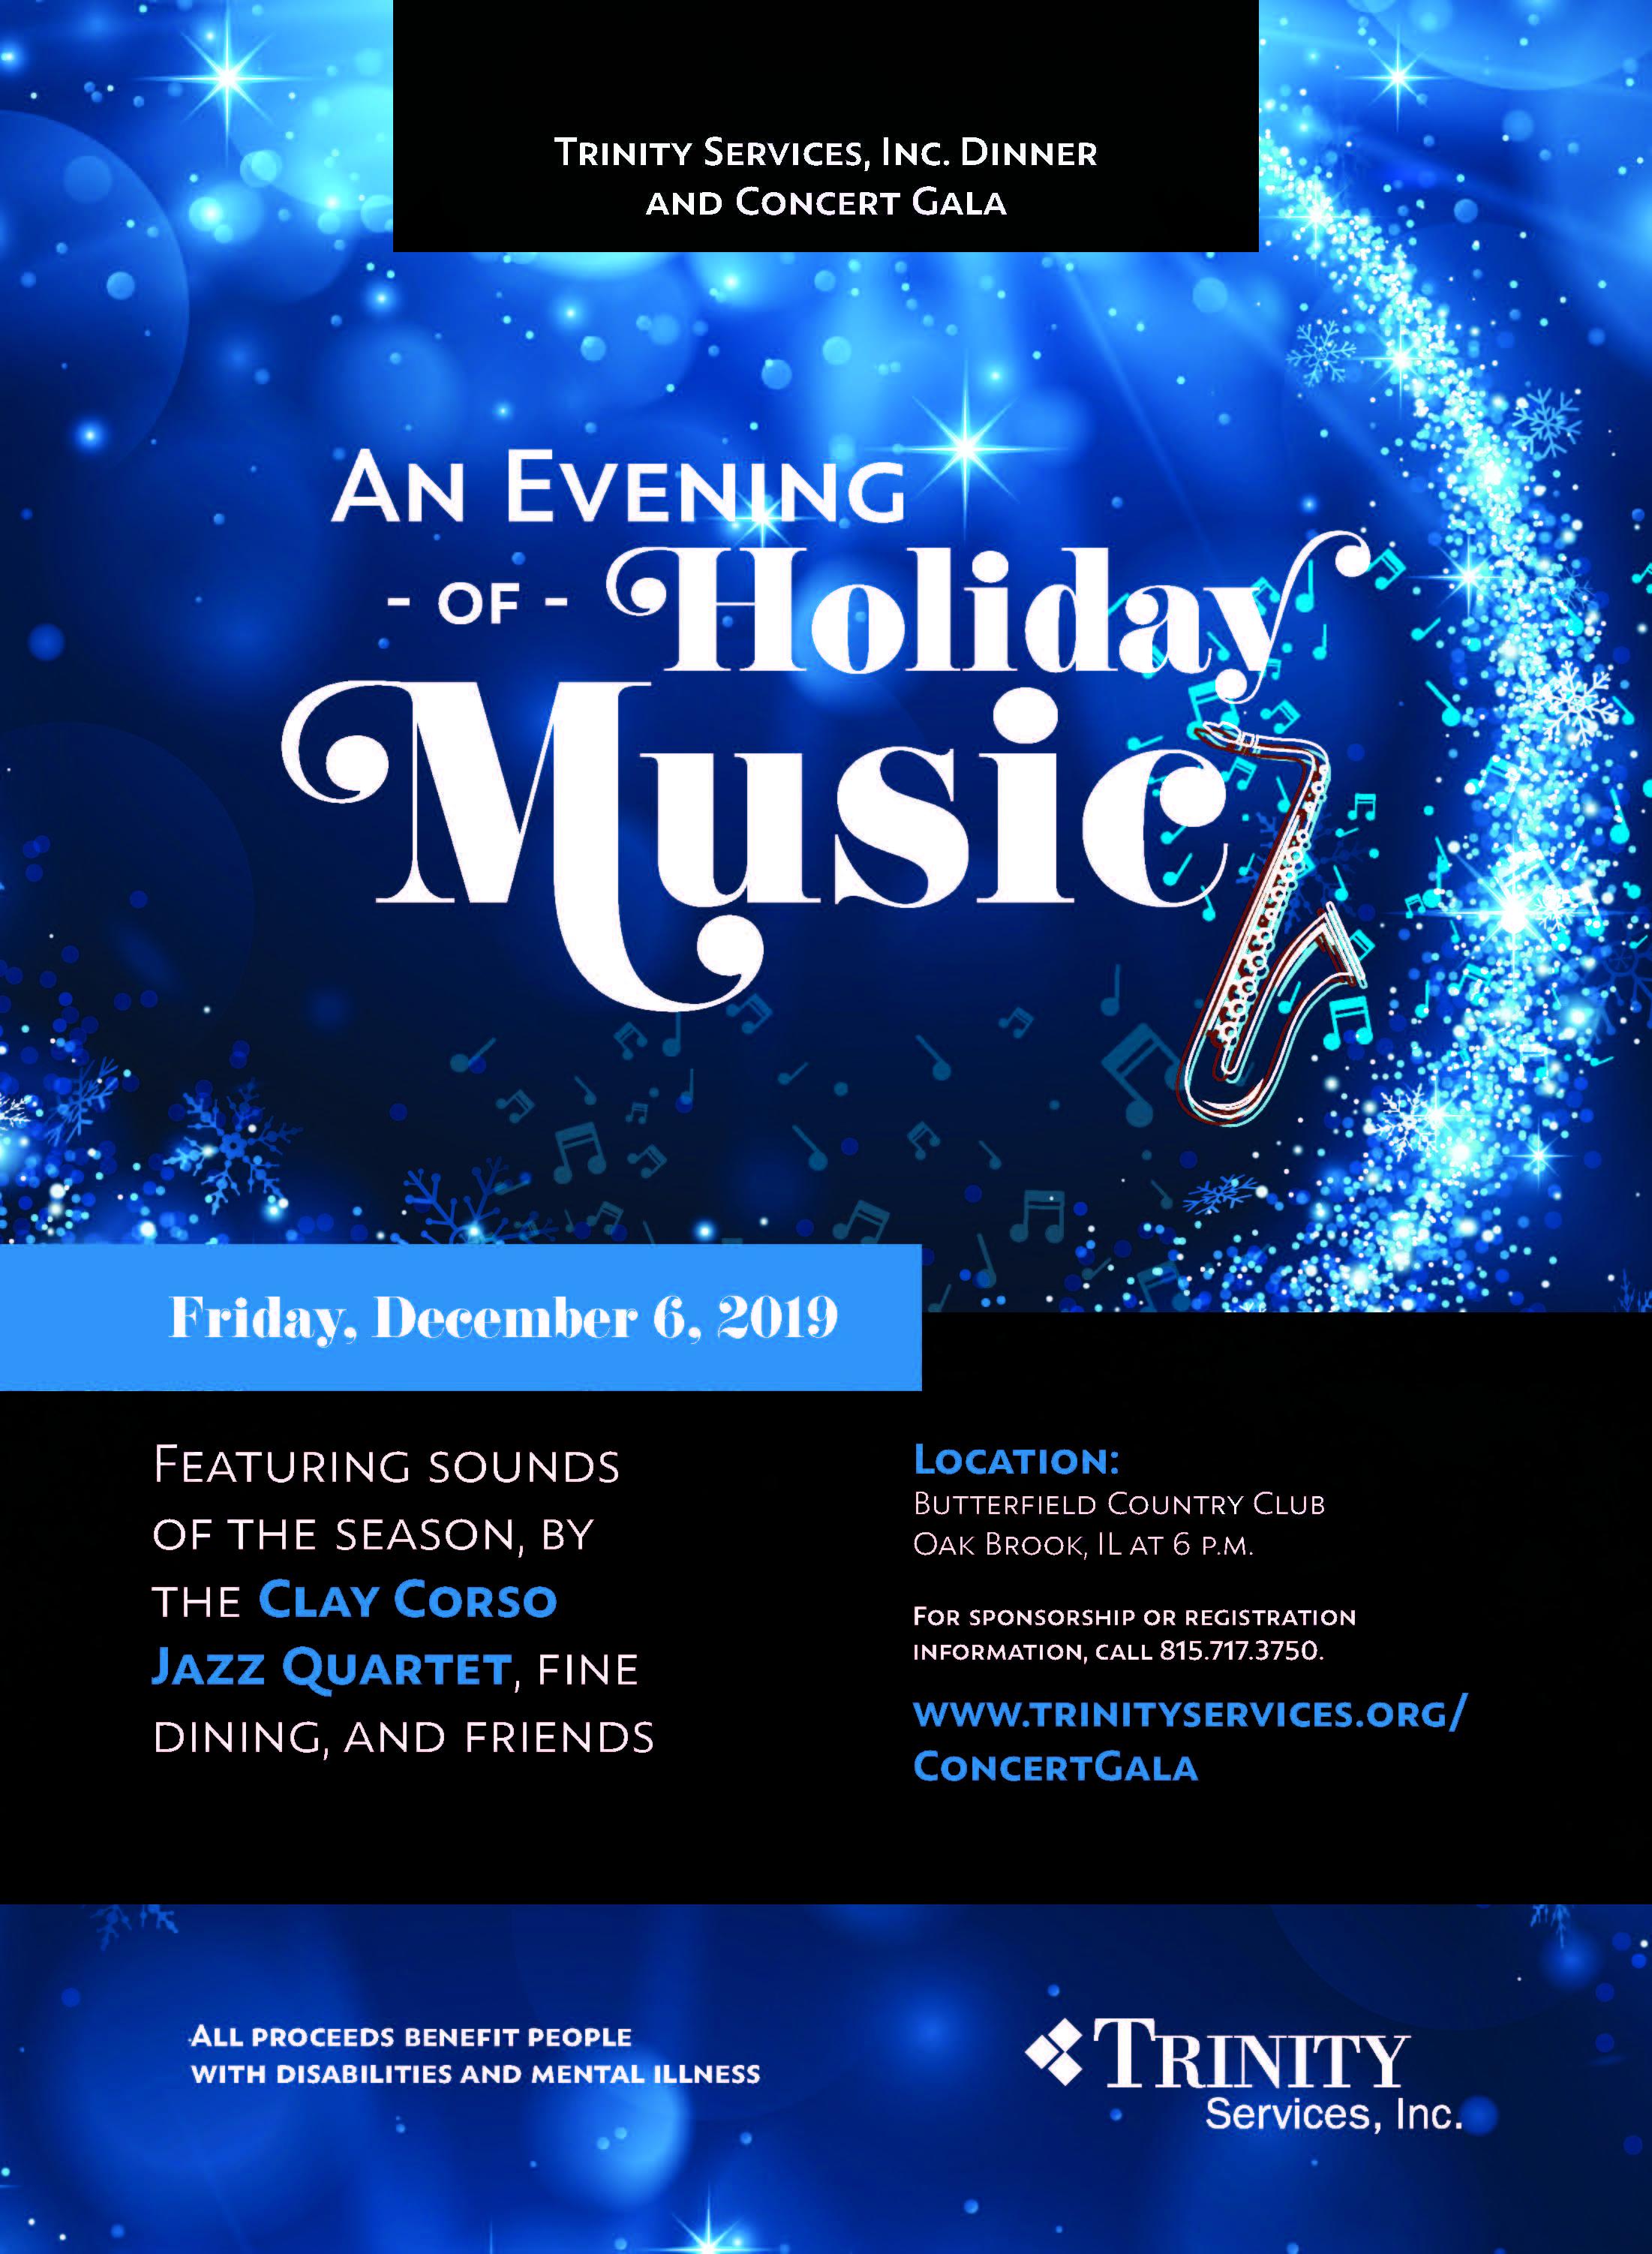 Concert Gala 2019 Flyer